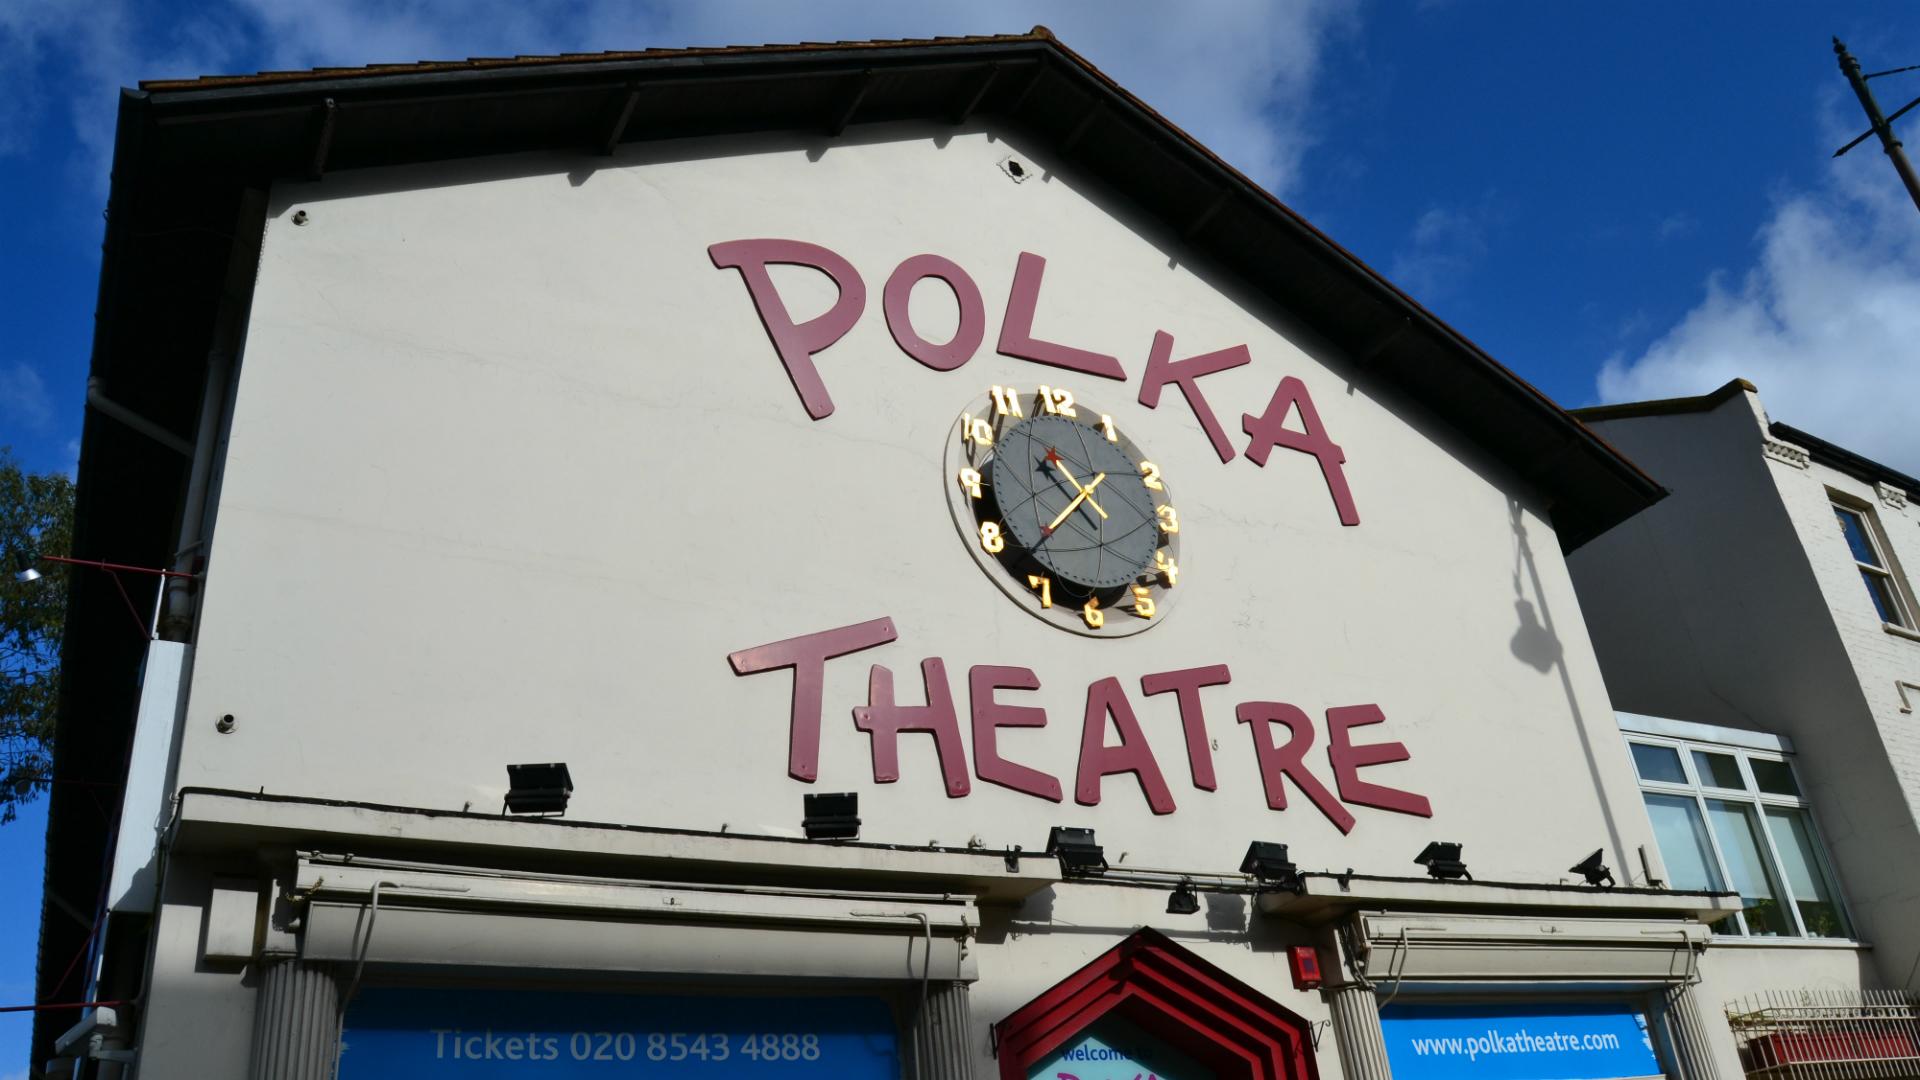 Polka Theatre. Image courtesy of Polka Theatre.